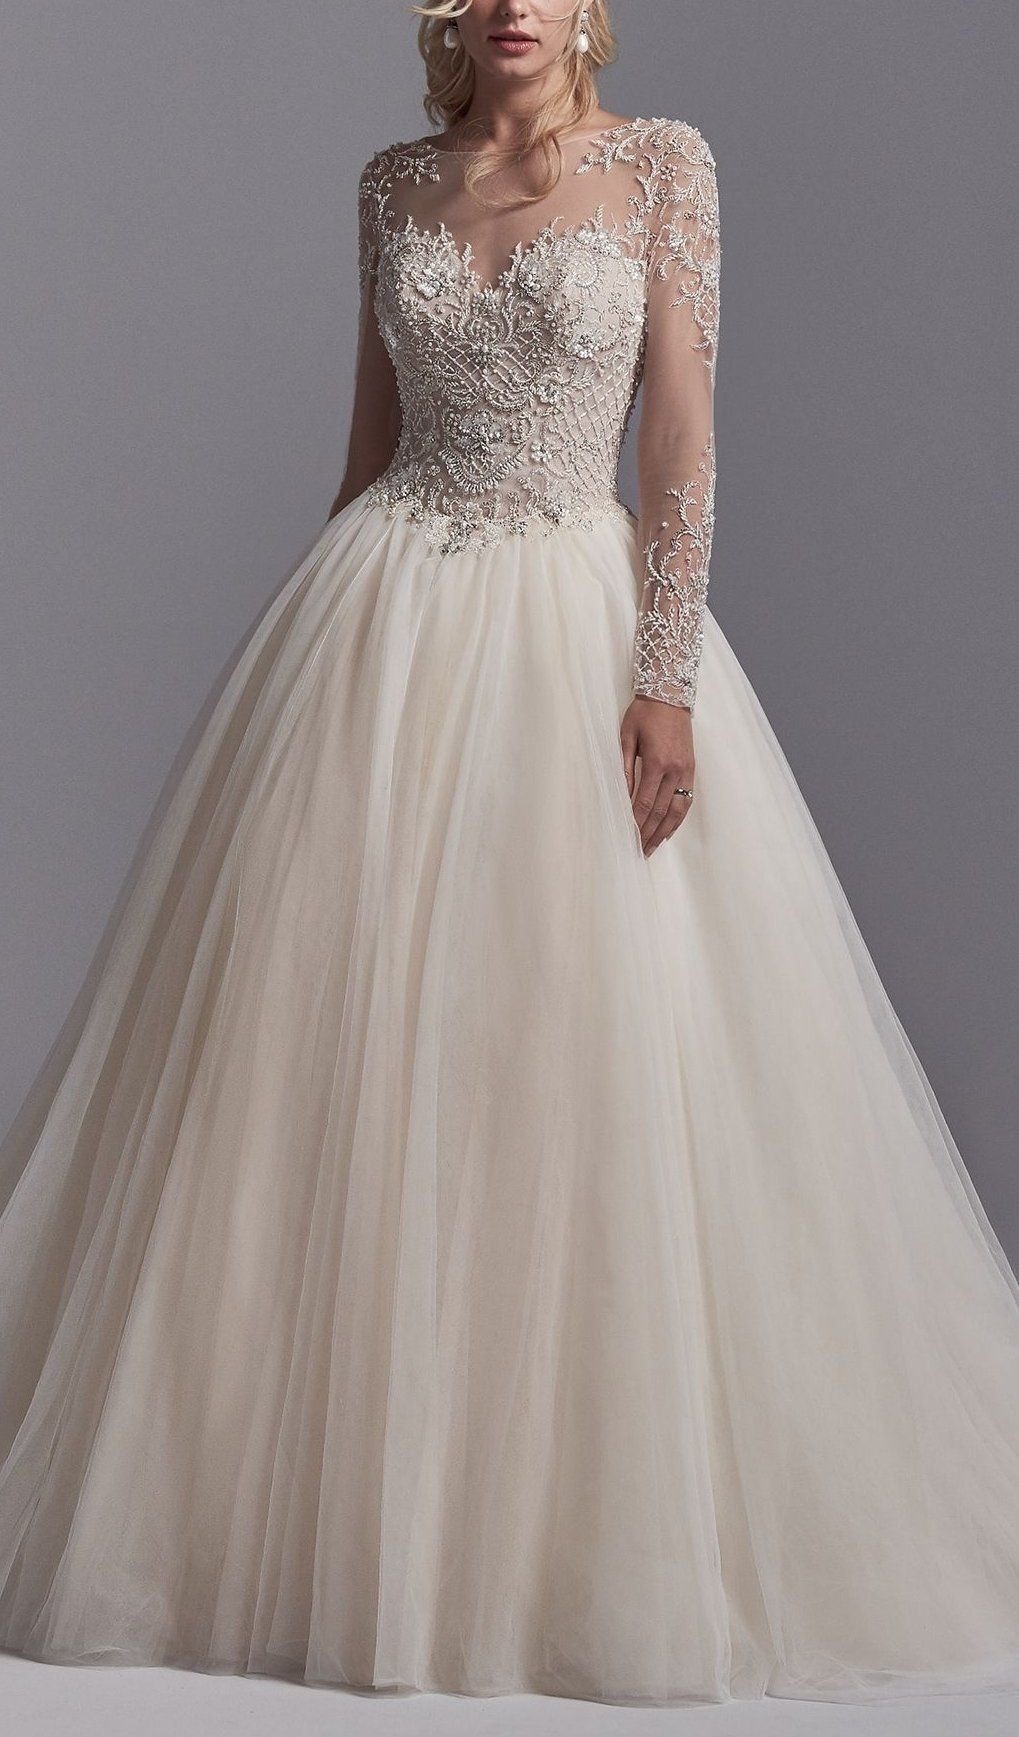 6 Best Wedding Dresses for a Rustic Wedding | The Vintage Bride ...